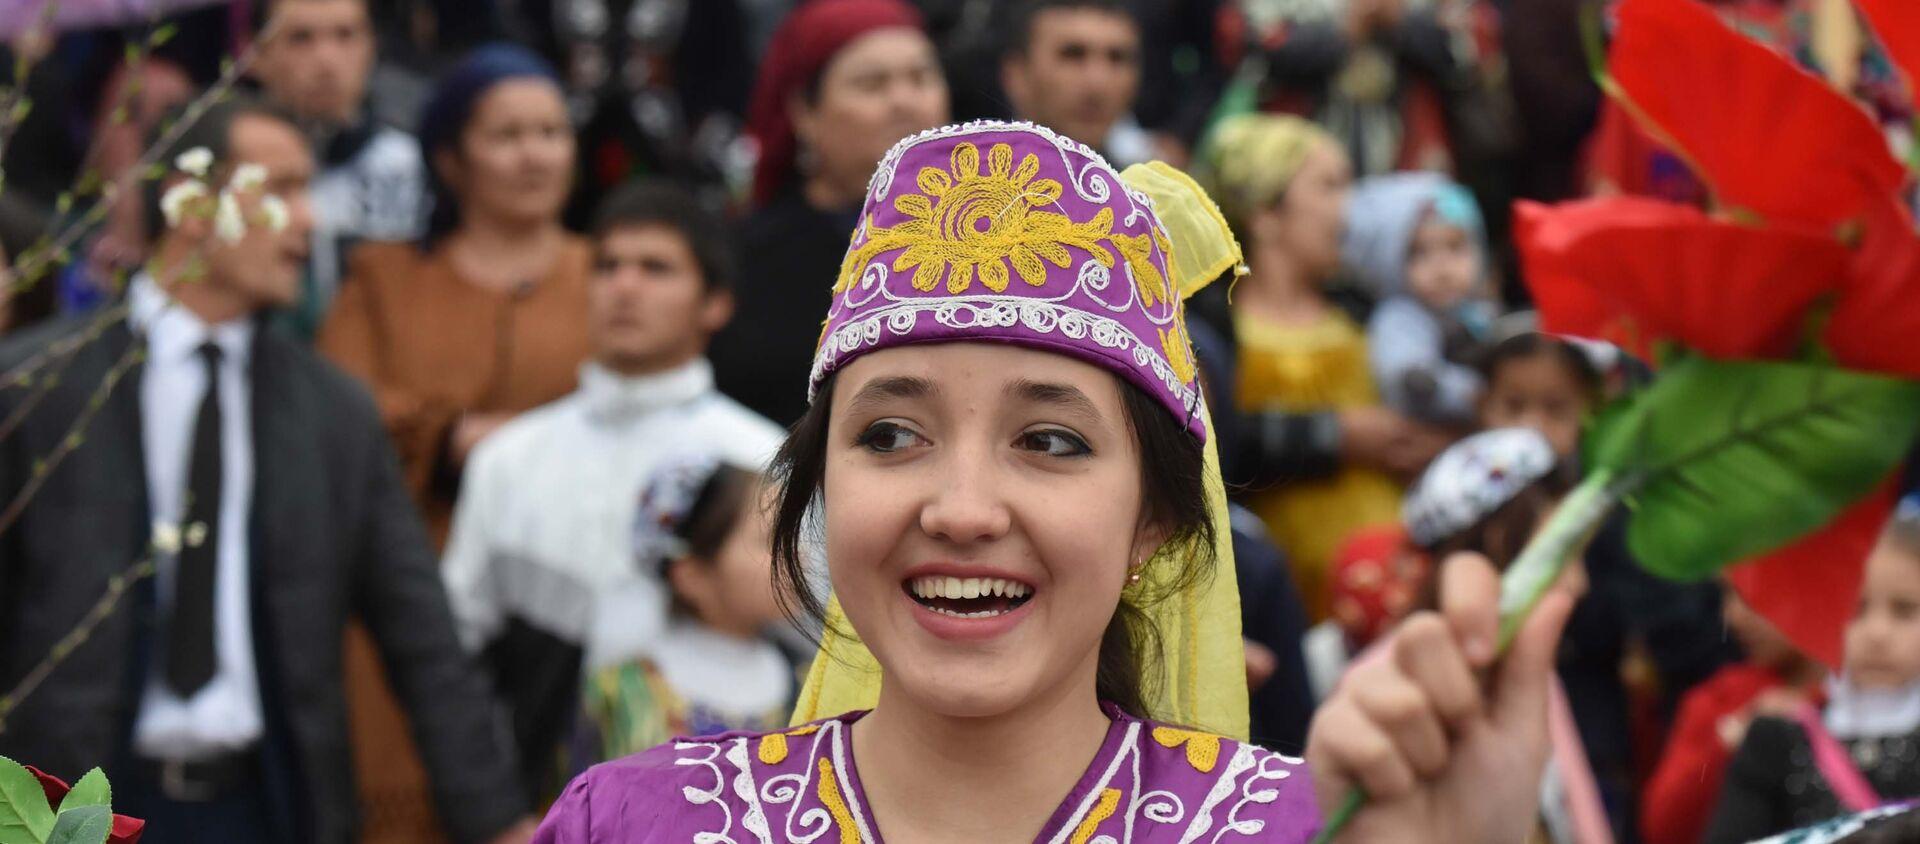 Празднование Навруза в Душанбе - Sputnik Тоҷикистон, 1920, 04.04.2021